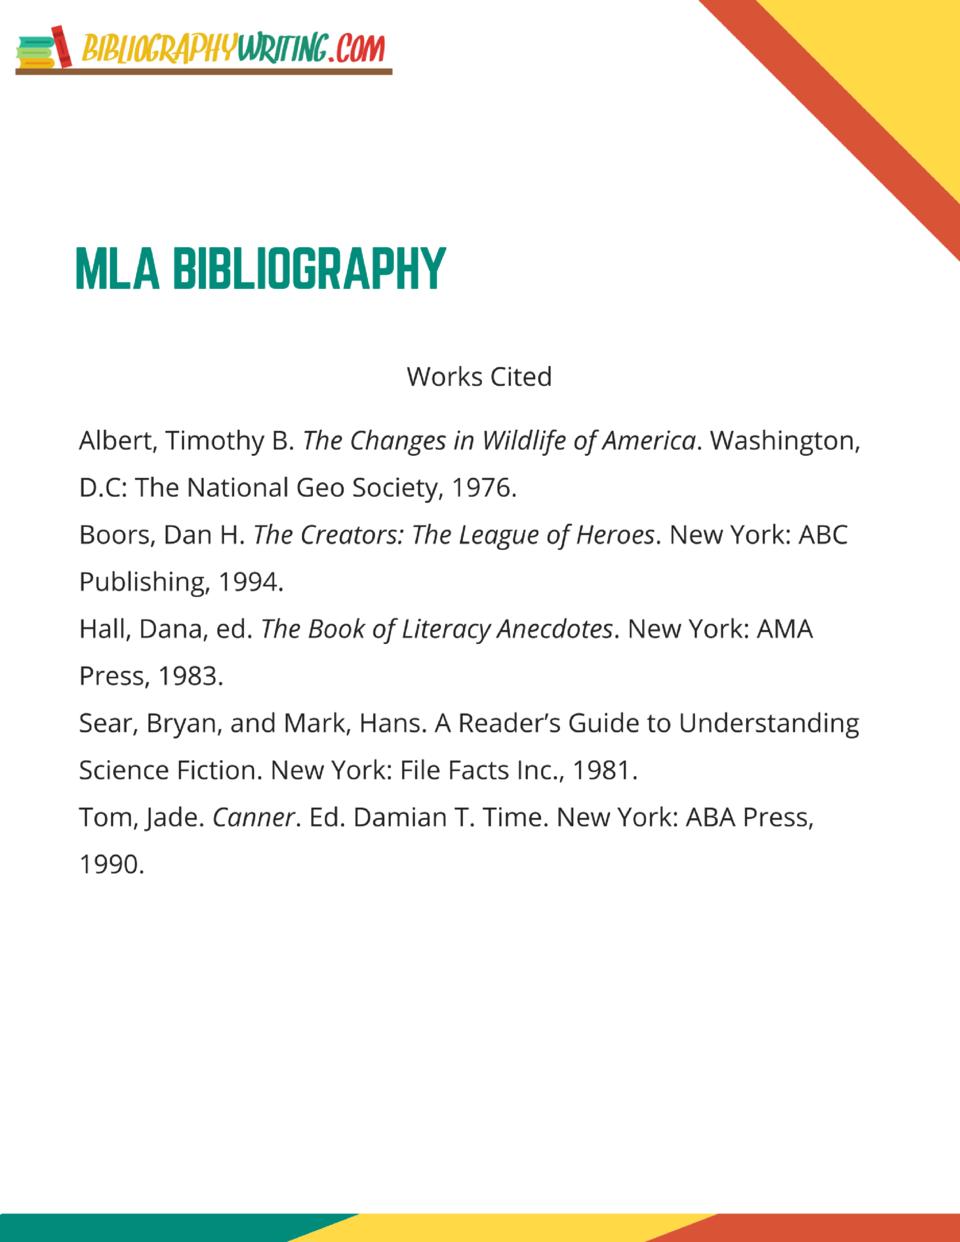 Do write a bibliography